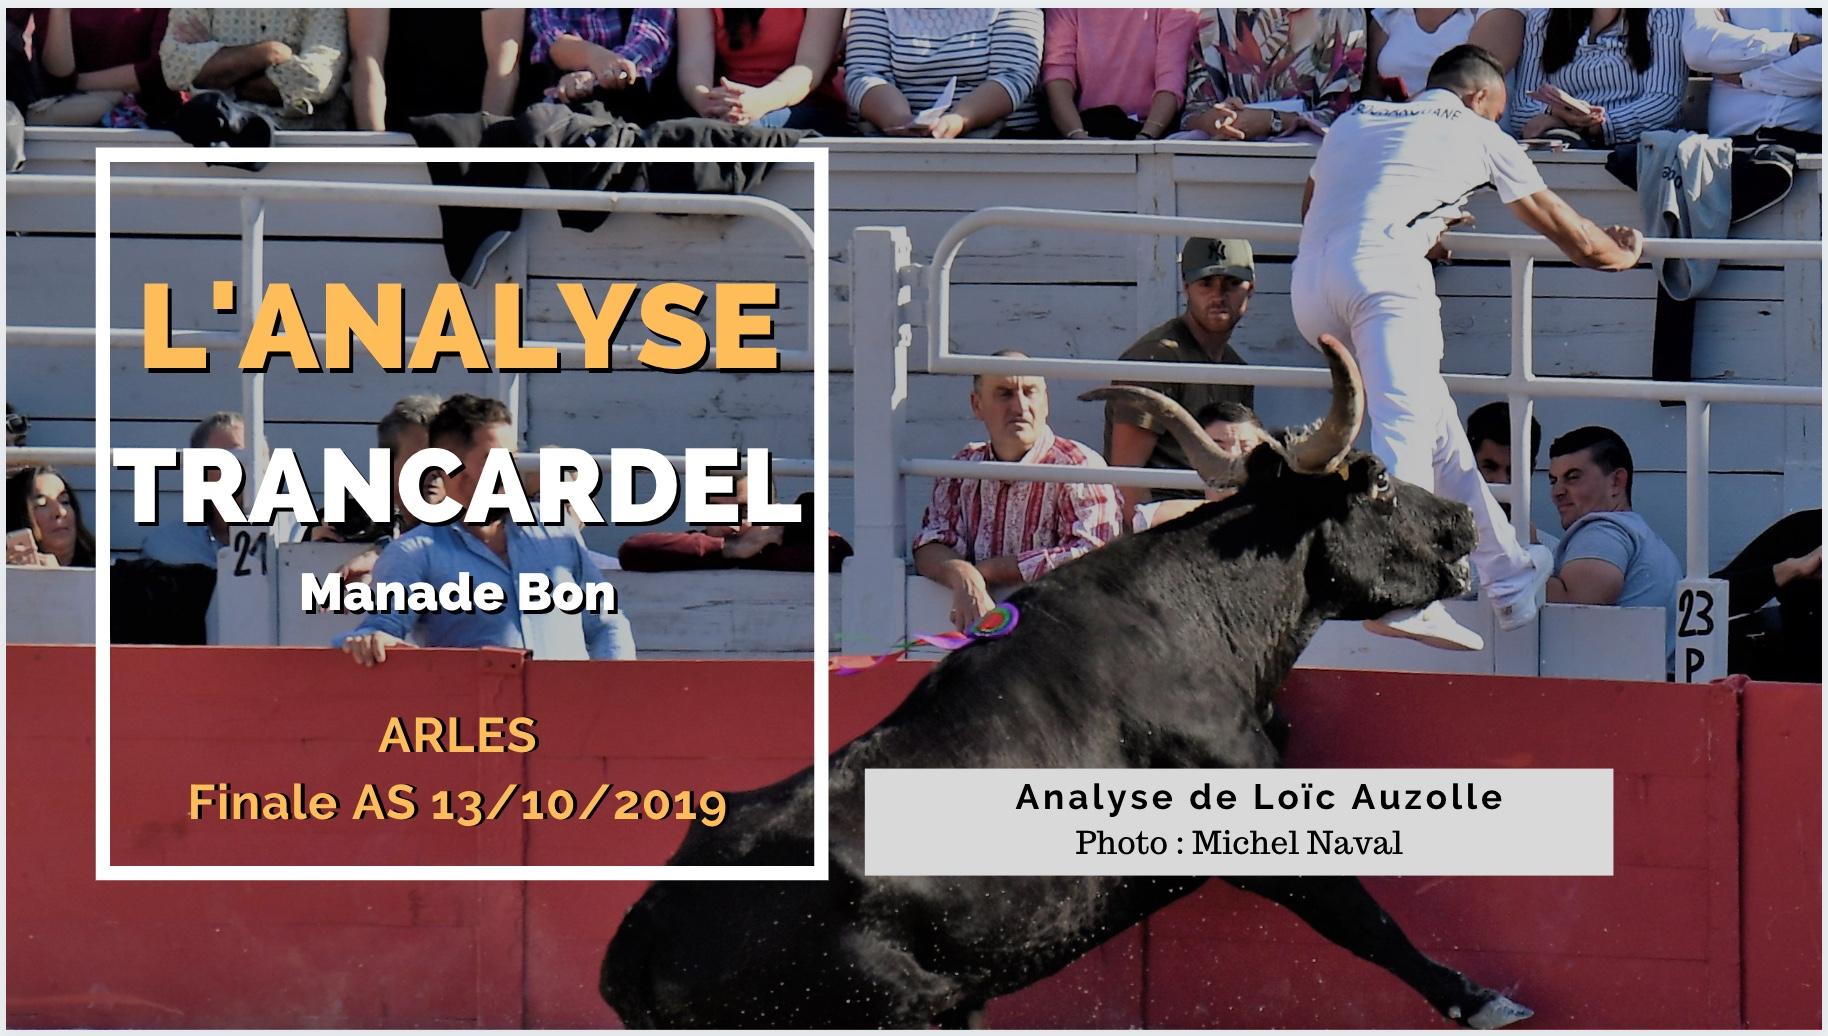 L'ANALYSE – Trancardel (Bon) – Finale AS Arles 13/10/2019